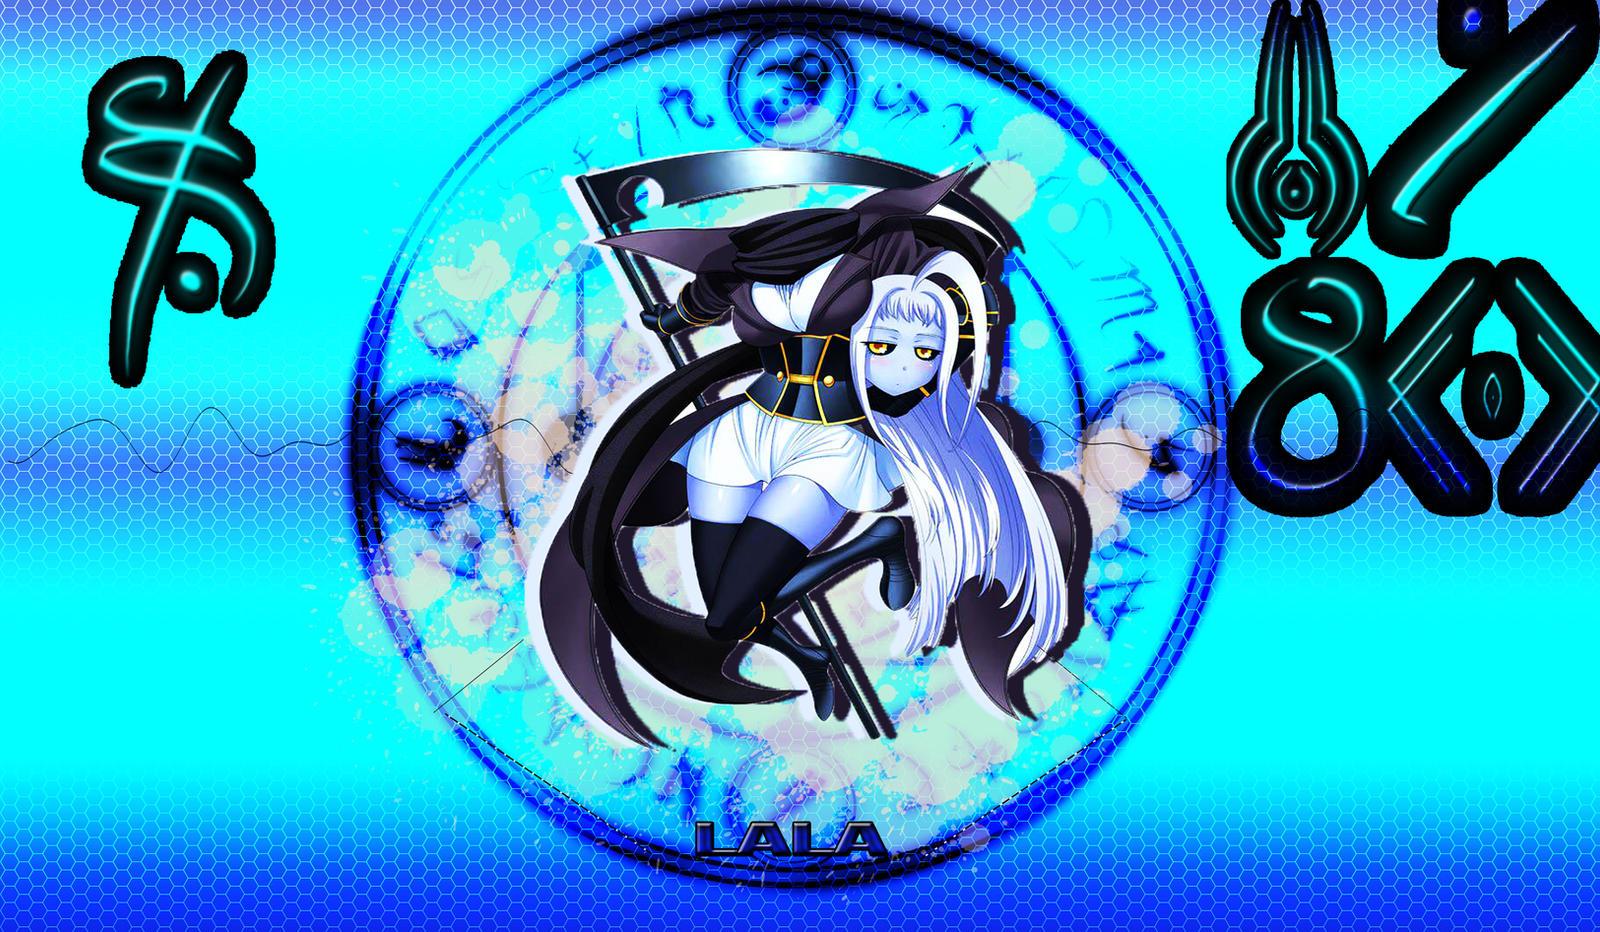 Monster Musume No Iru Nichijou Lala Wallpaper By Mortred039ex On